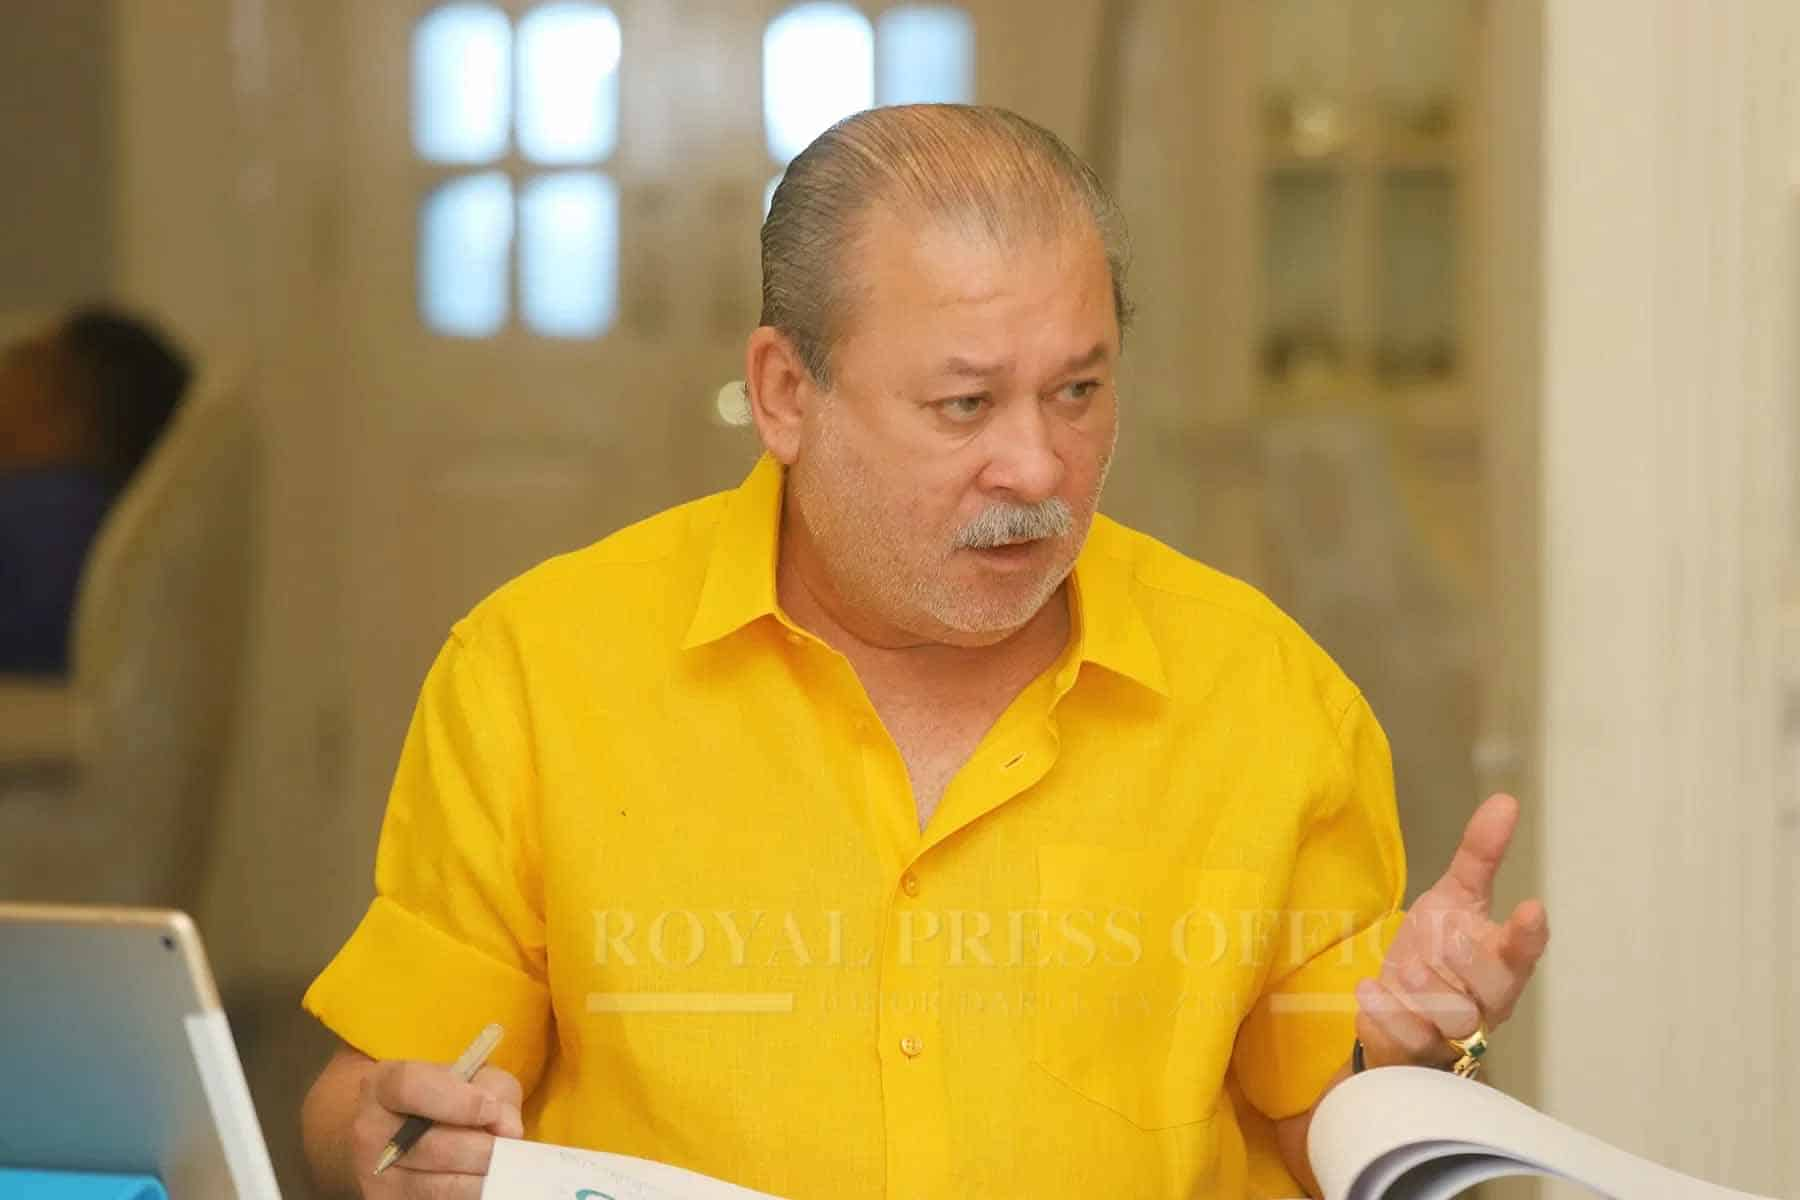 Orang cina adalah bangsa Johor, sama dengan orang melayu – Sultan Johor